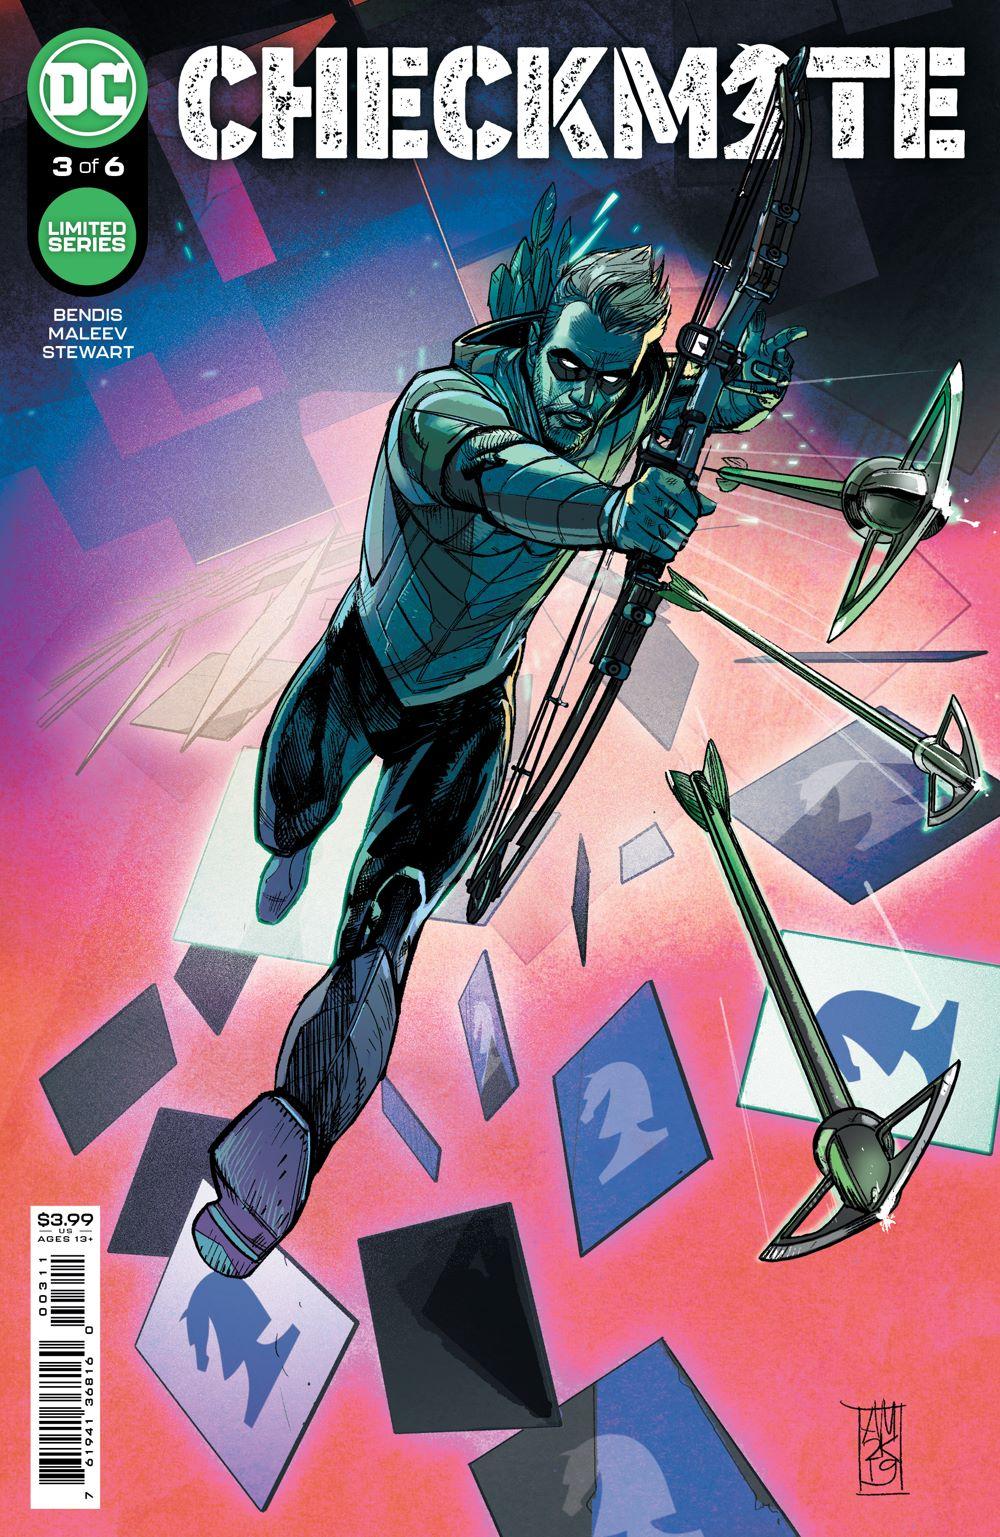 CHECKMATE_Cv3 DC Comics August 2021 Solicitations